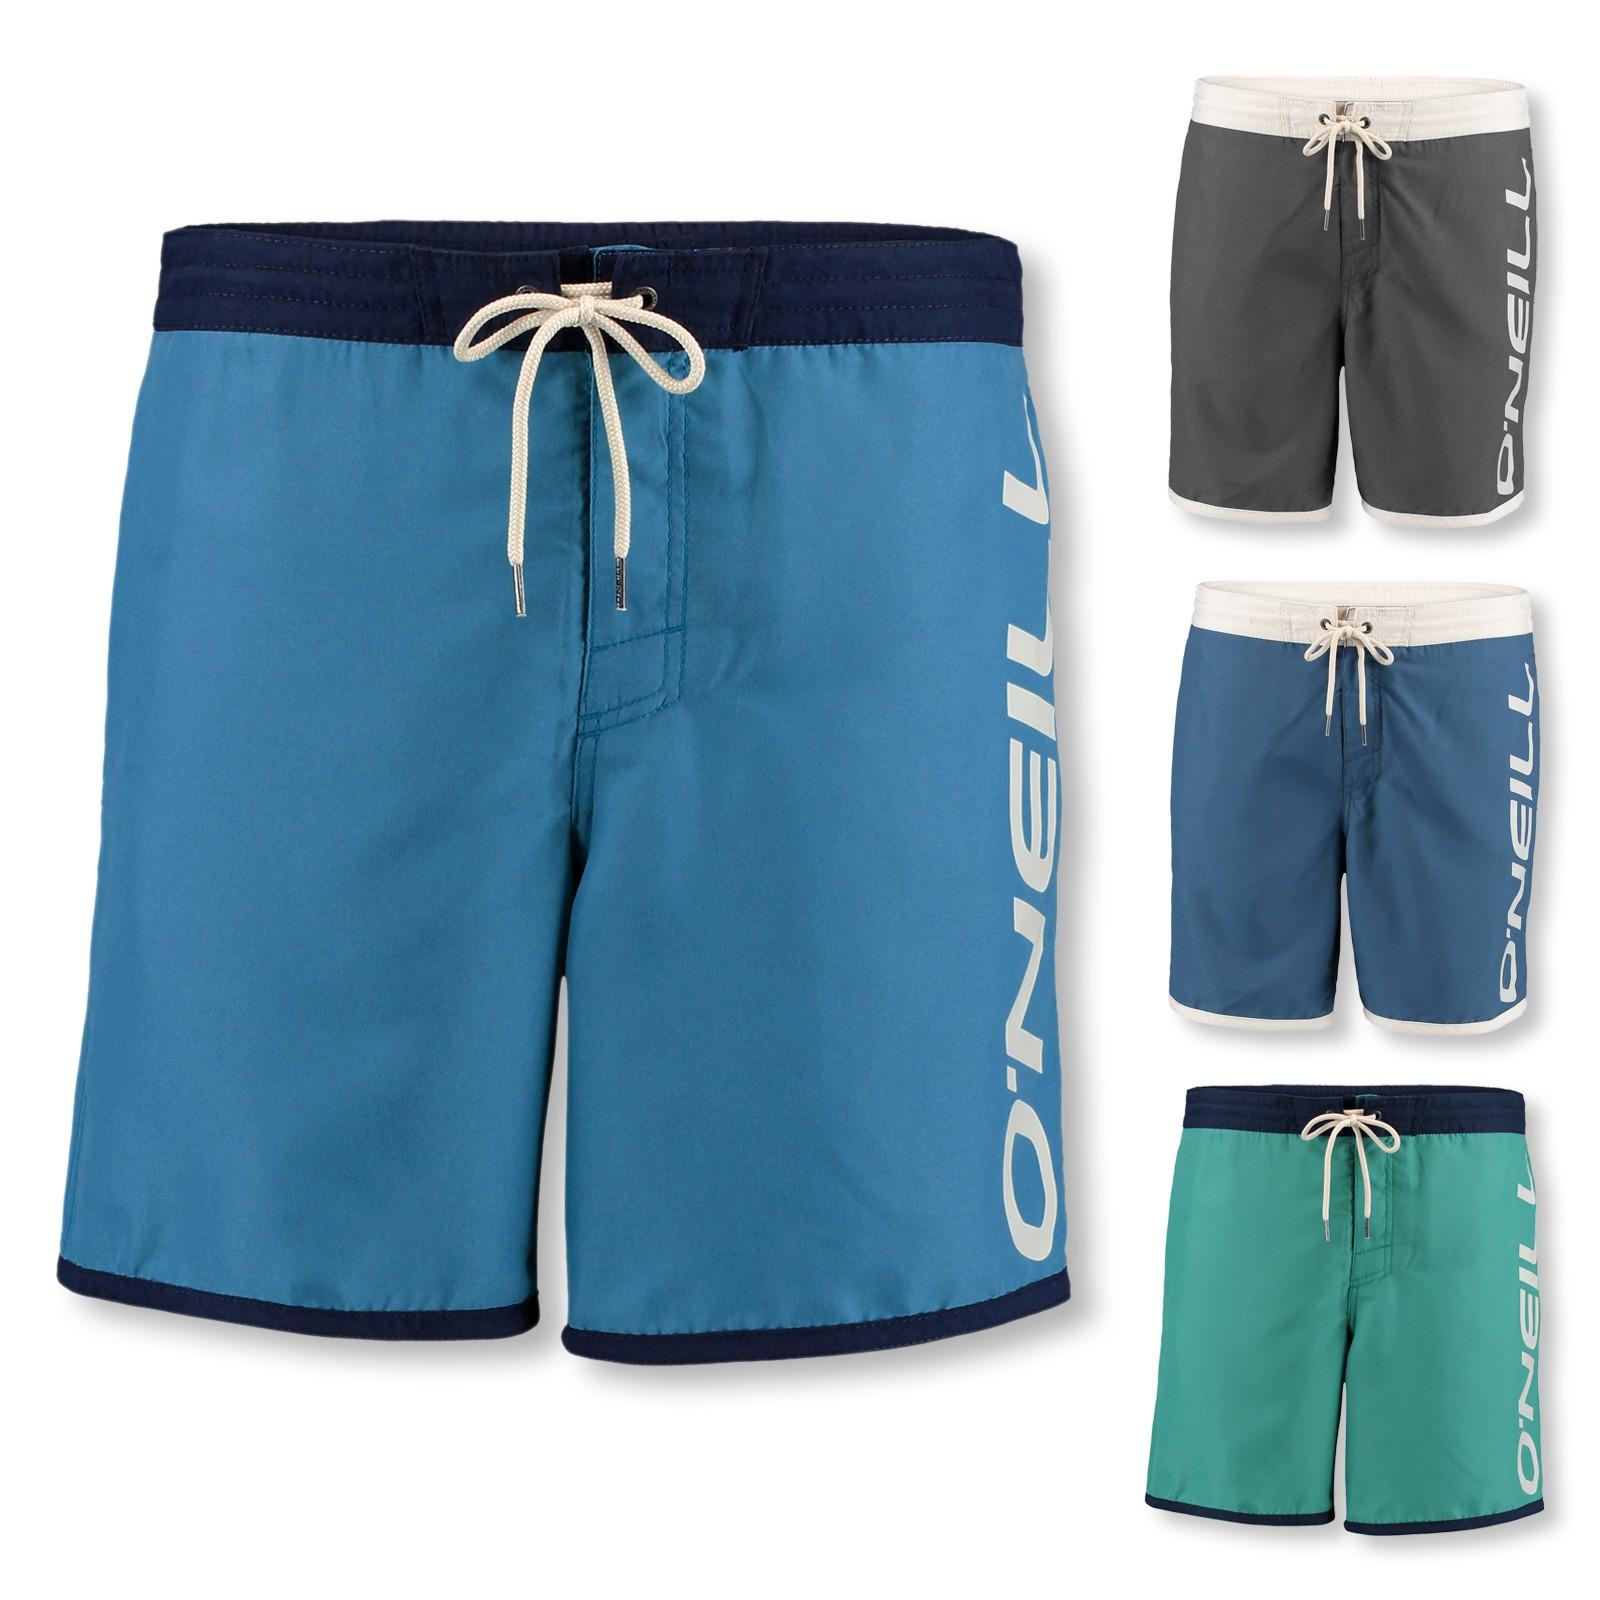 O'Neill Badeshorts Naval Shorts 7A3229 M L XL 2XL in green-blue slate